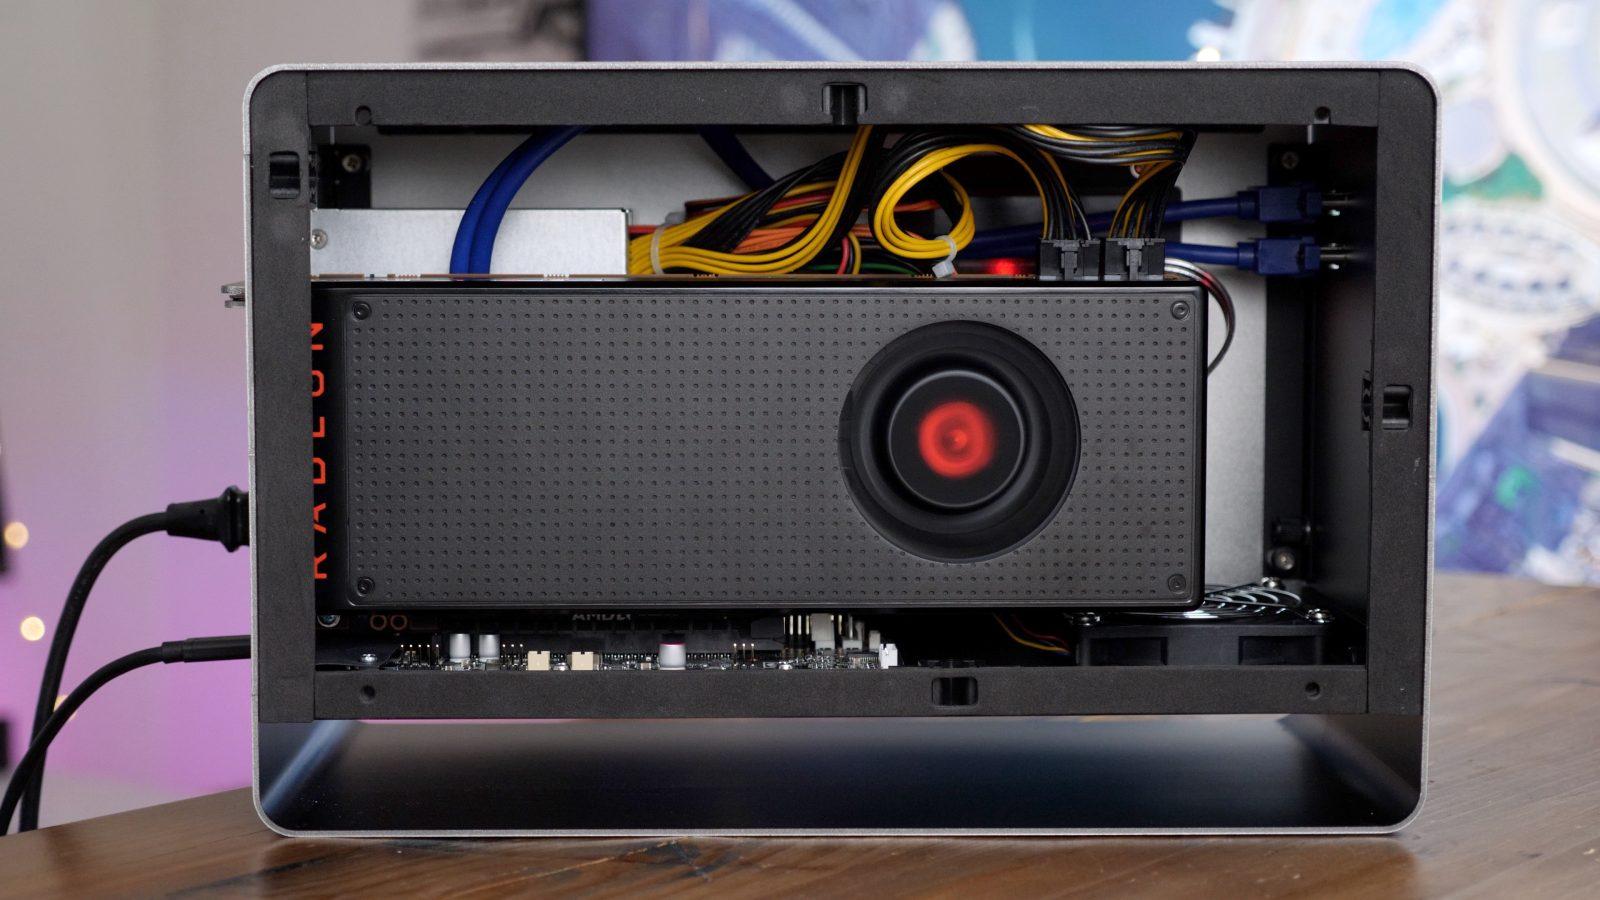 eGPU progress report: hands-on with the AMD RX Vega 64 +